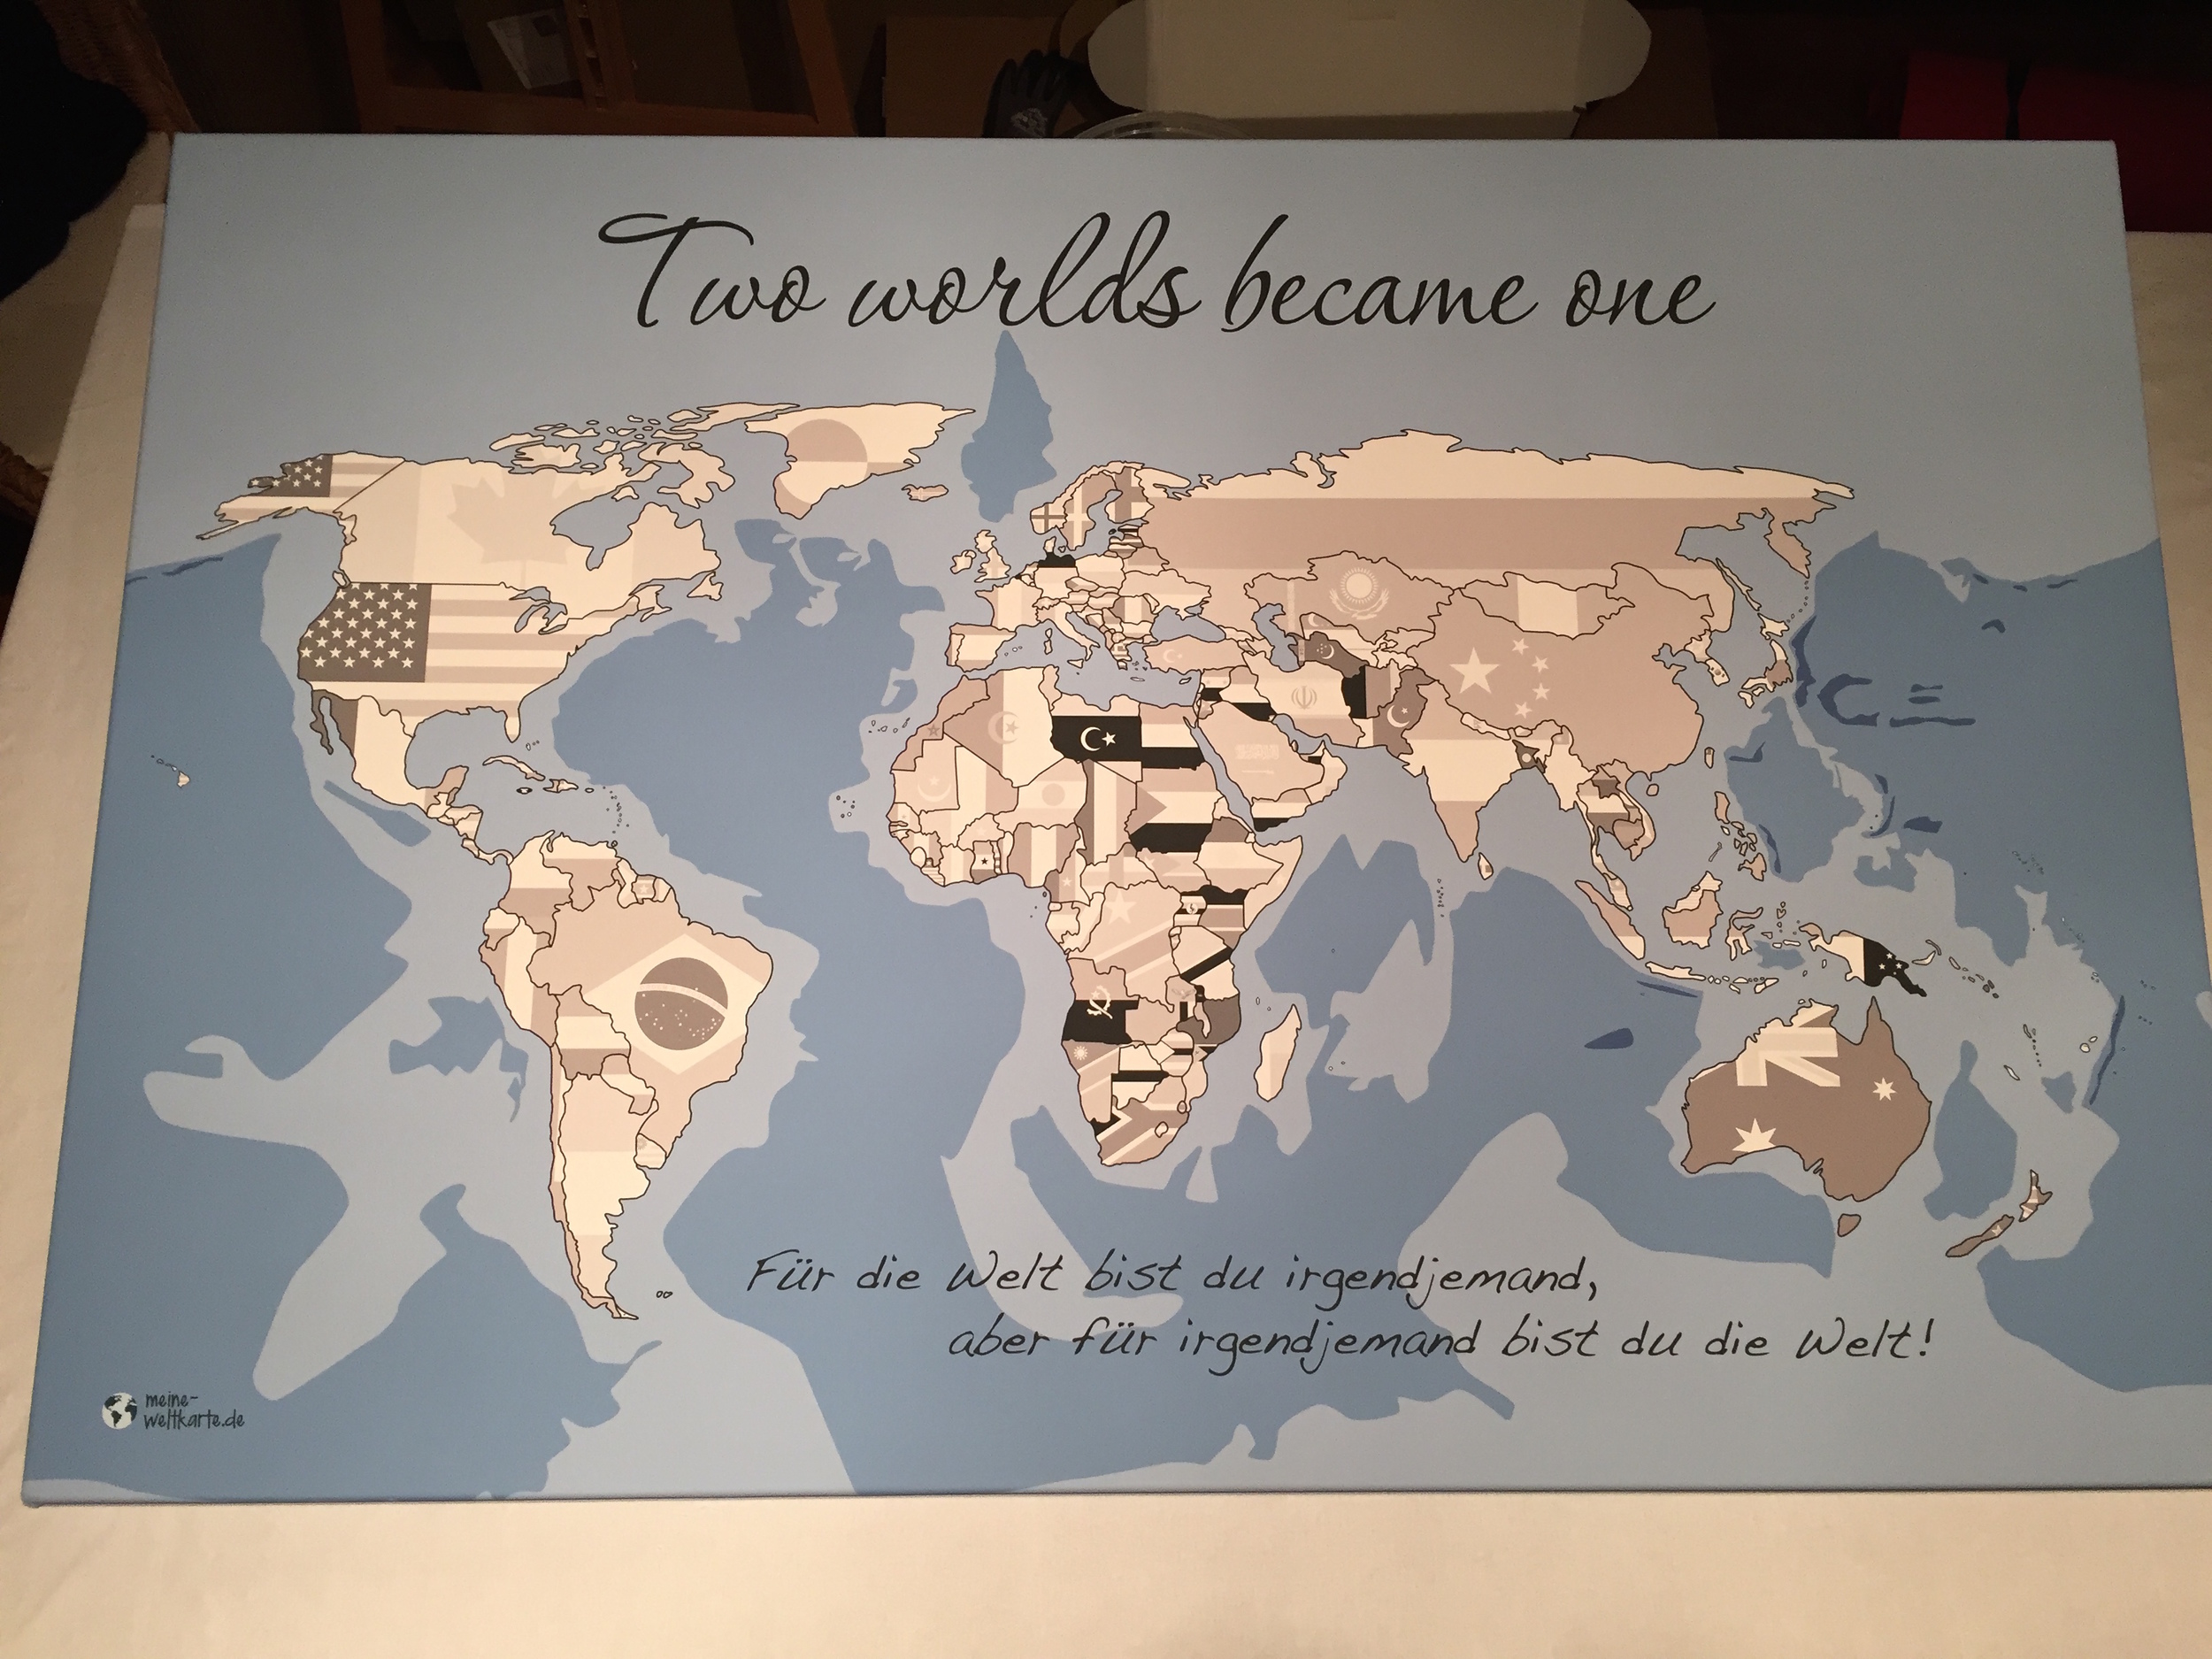 Weltkarte zum ausmalen wo man bereits war.JPG